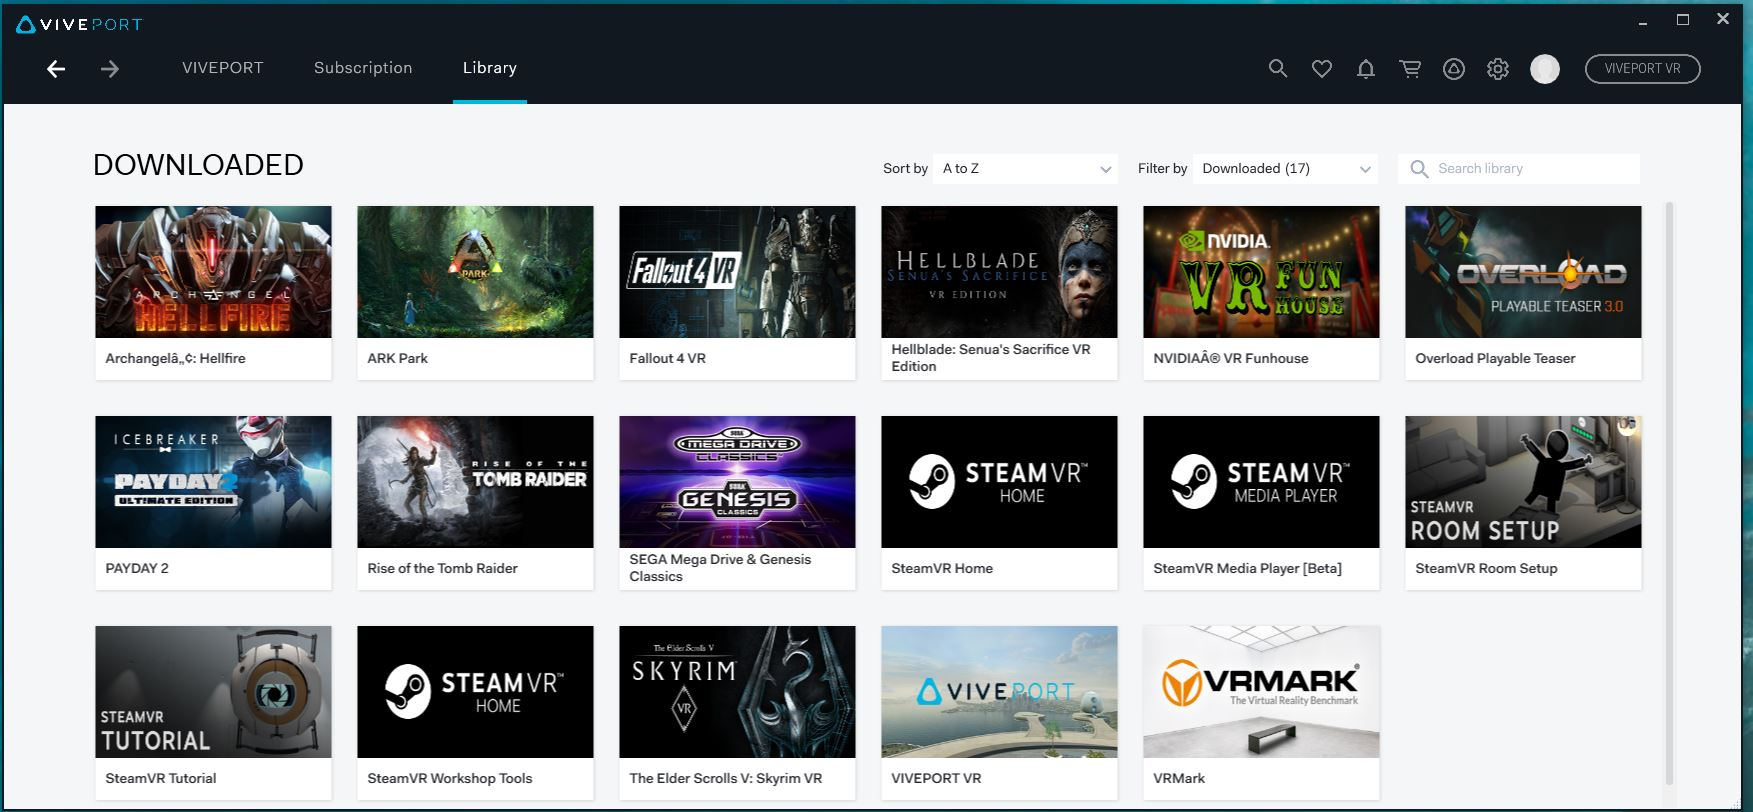 Introducing the Vive Pro versus the Oculus Rift Series - Part 1